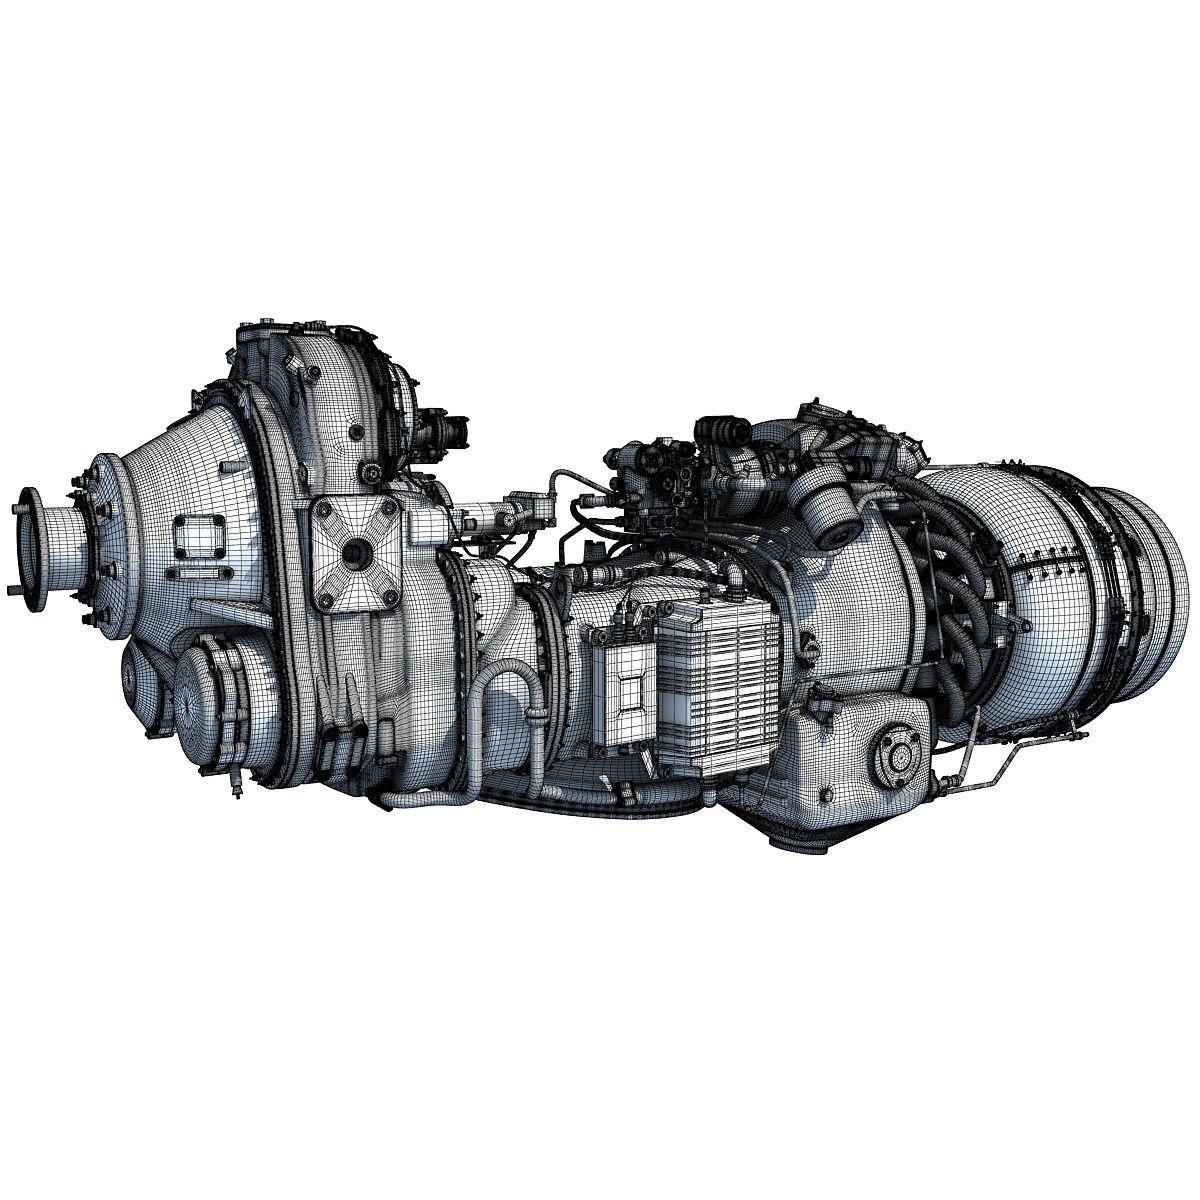 Used Turboprop: Pratt & Whitney Canada PW100 Turboprop Engine